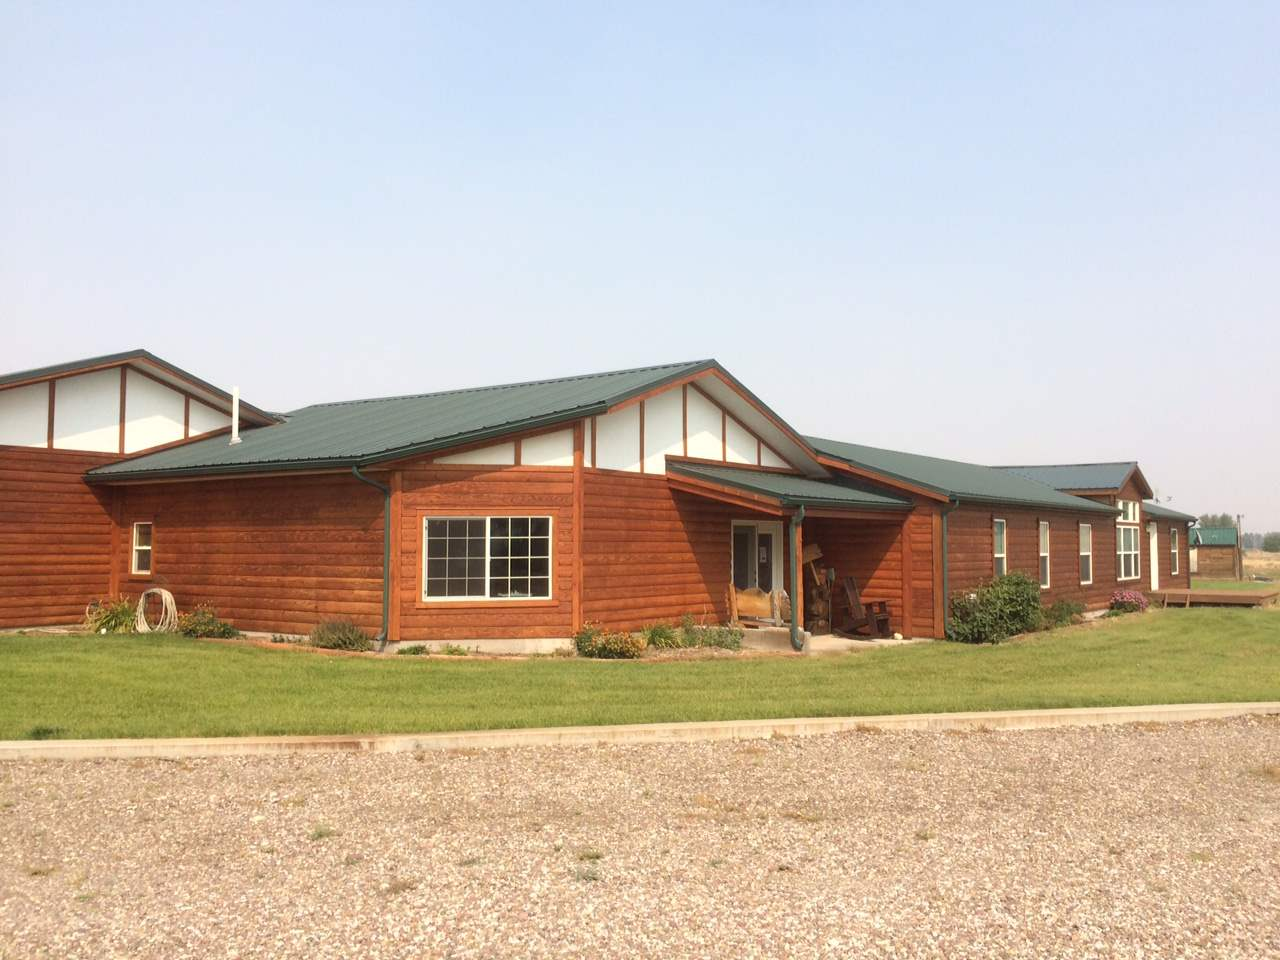 Real Estate for Sale, ListingId: 34936744, Vaughn,MT59487